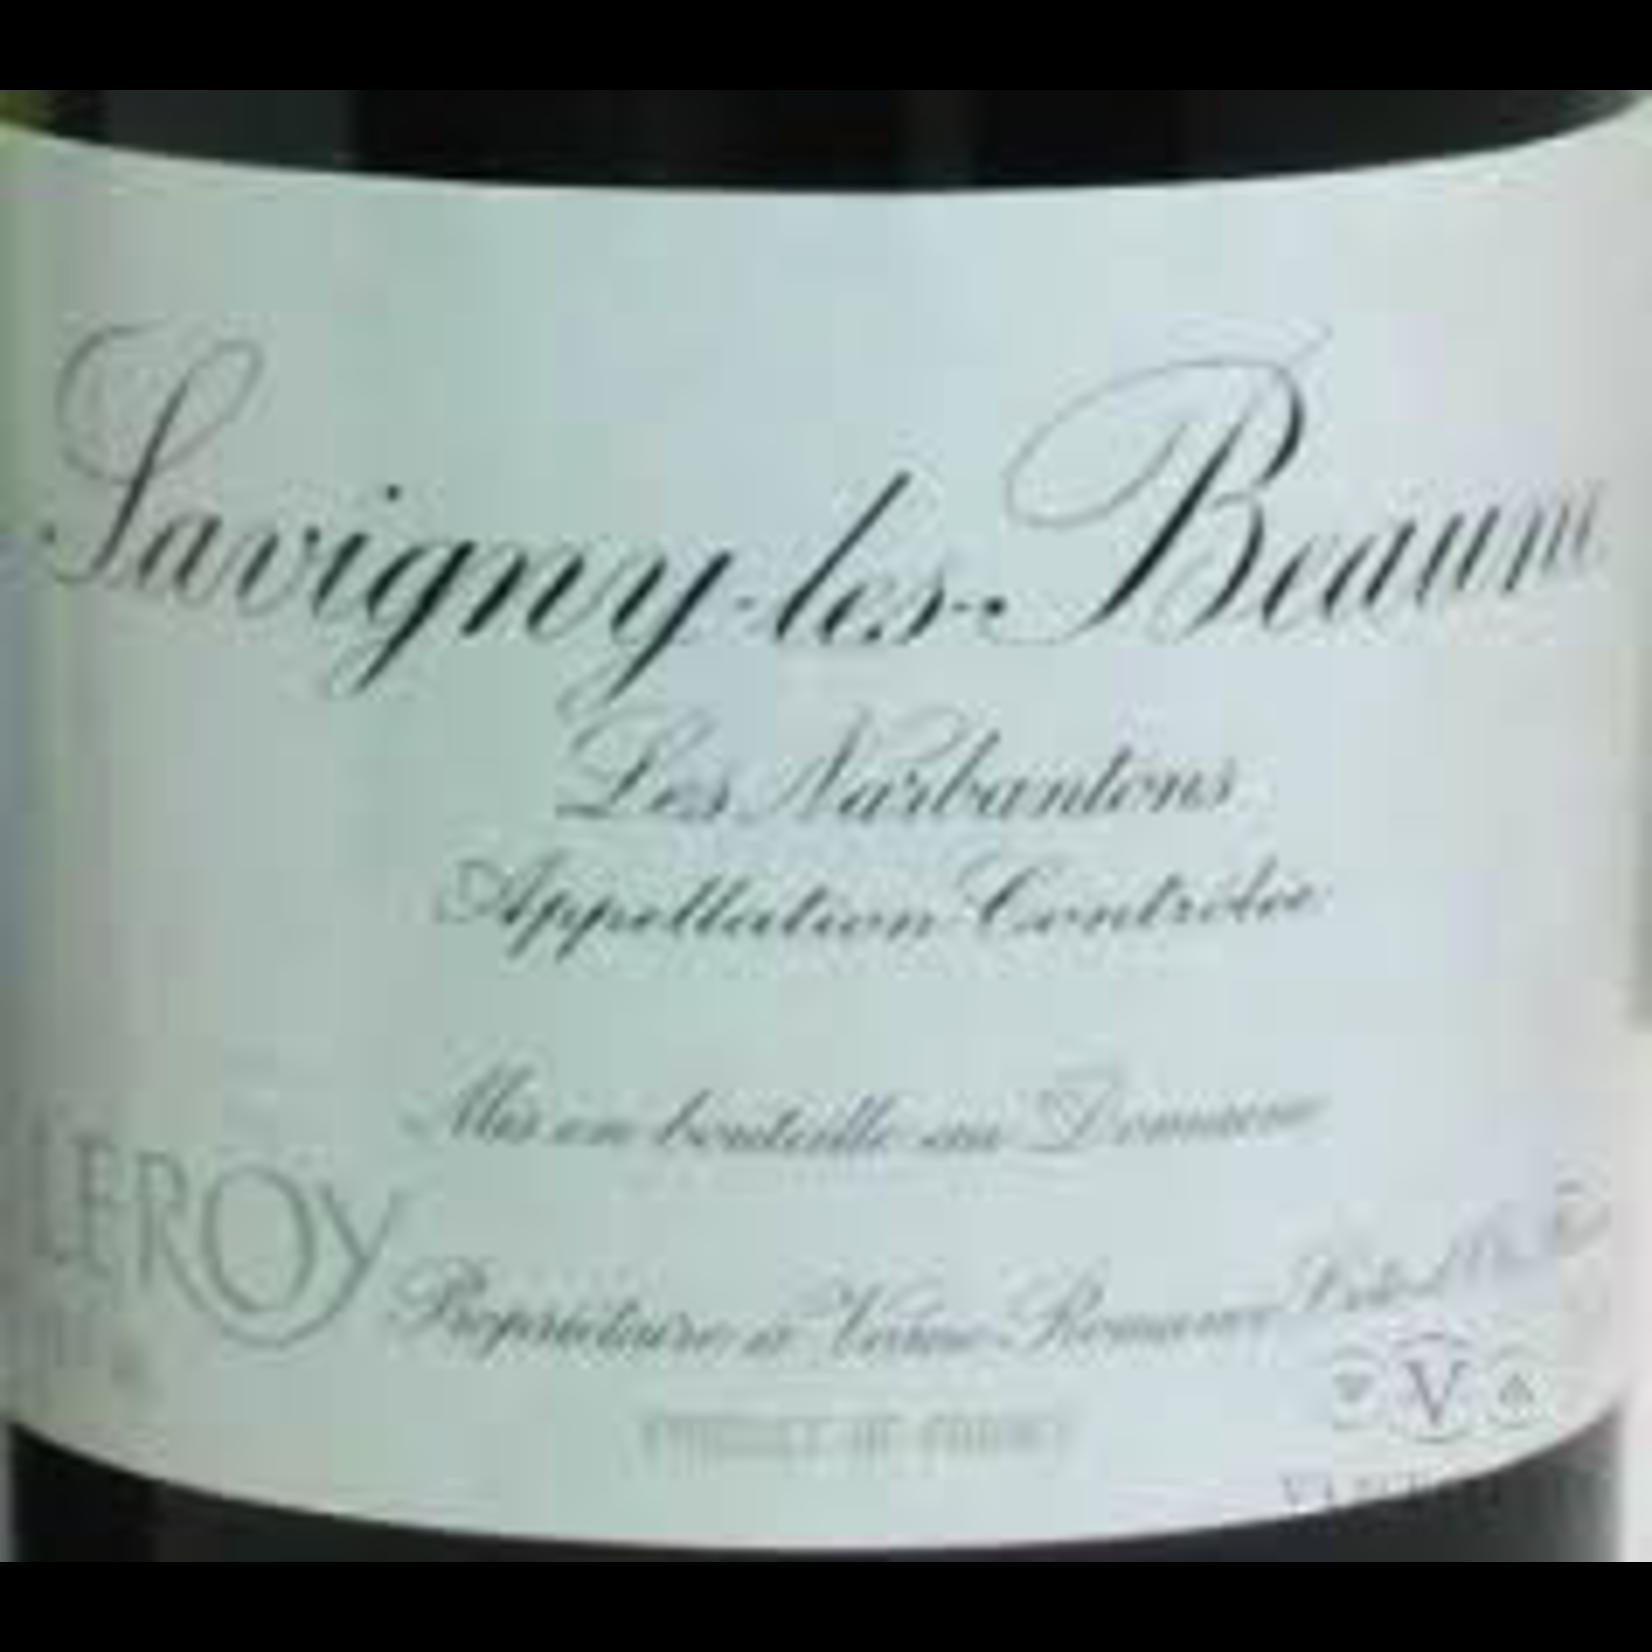 Domaine Leroy Savigny Les Beaune Les Narbanton Premier Cru 1978